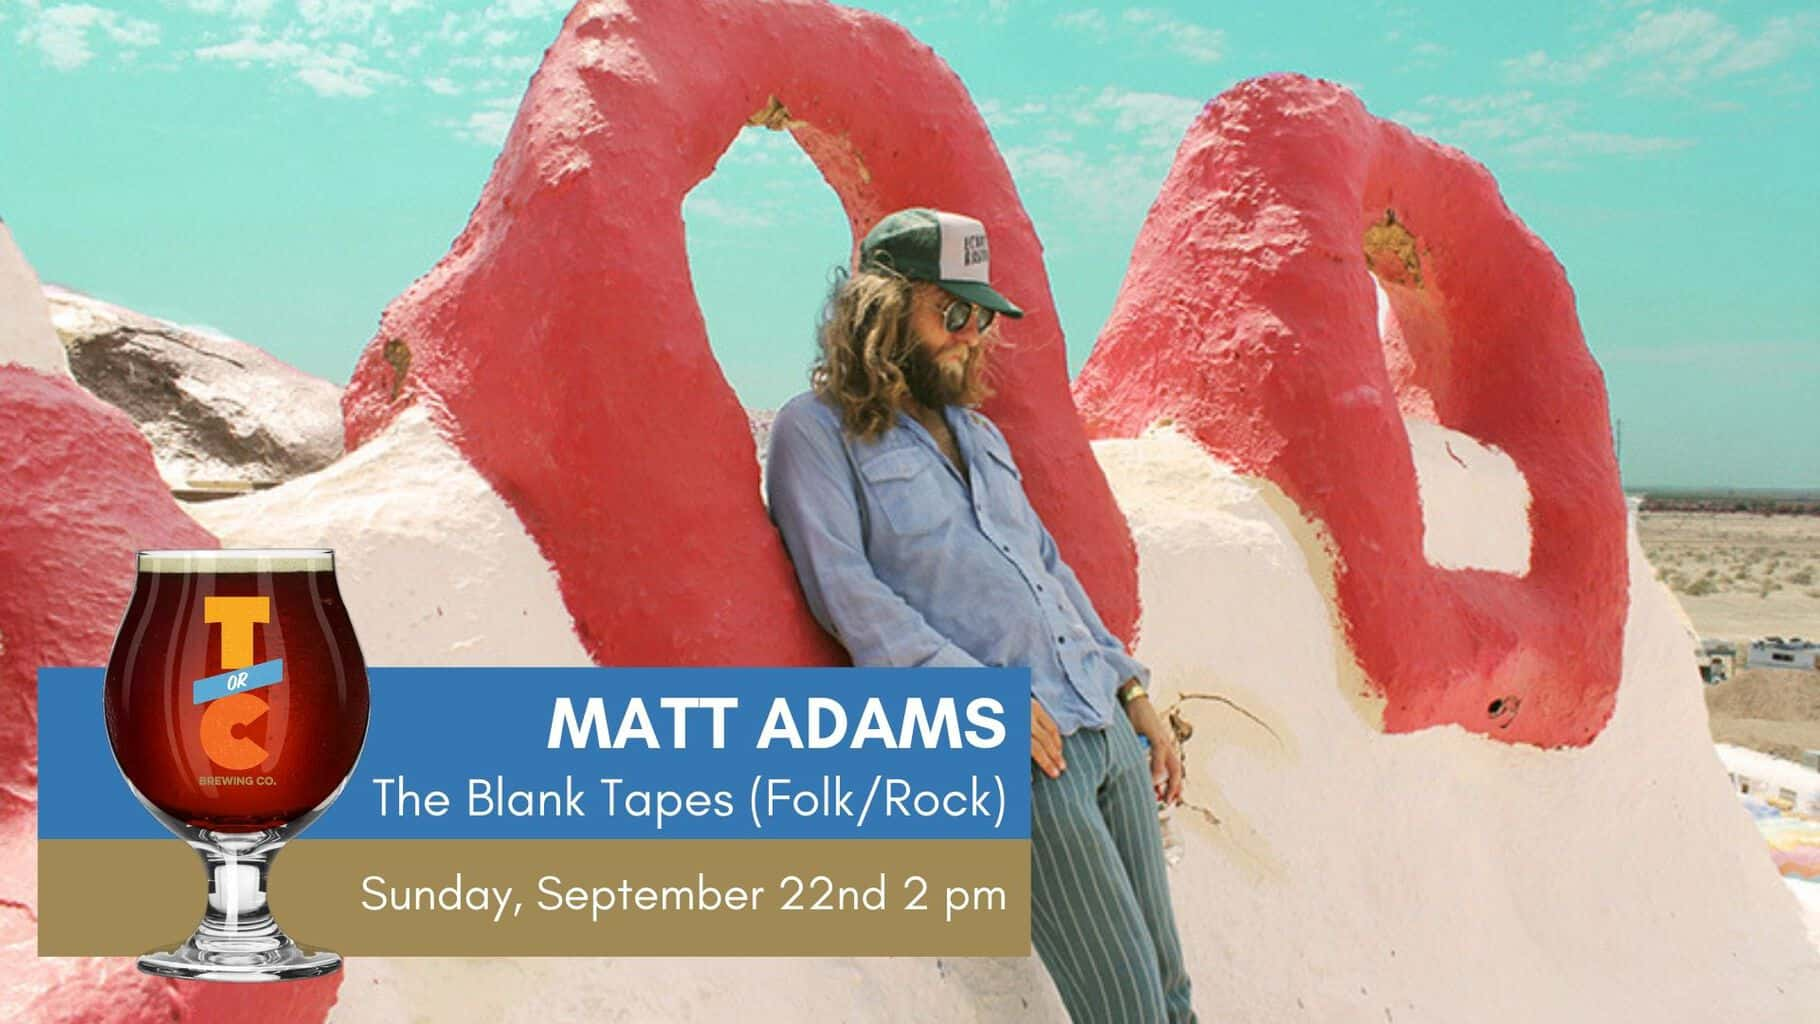 Matt Adams (The Blank Tapes)